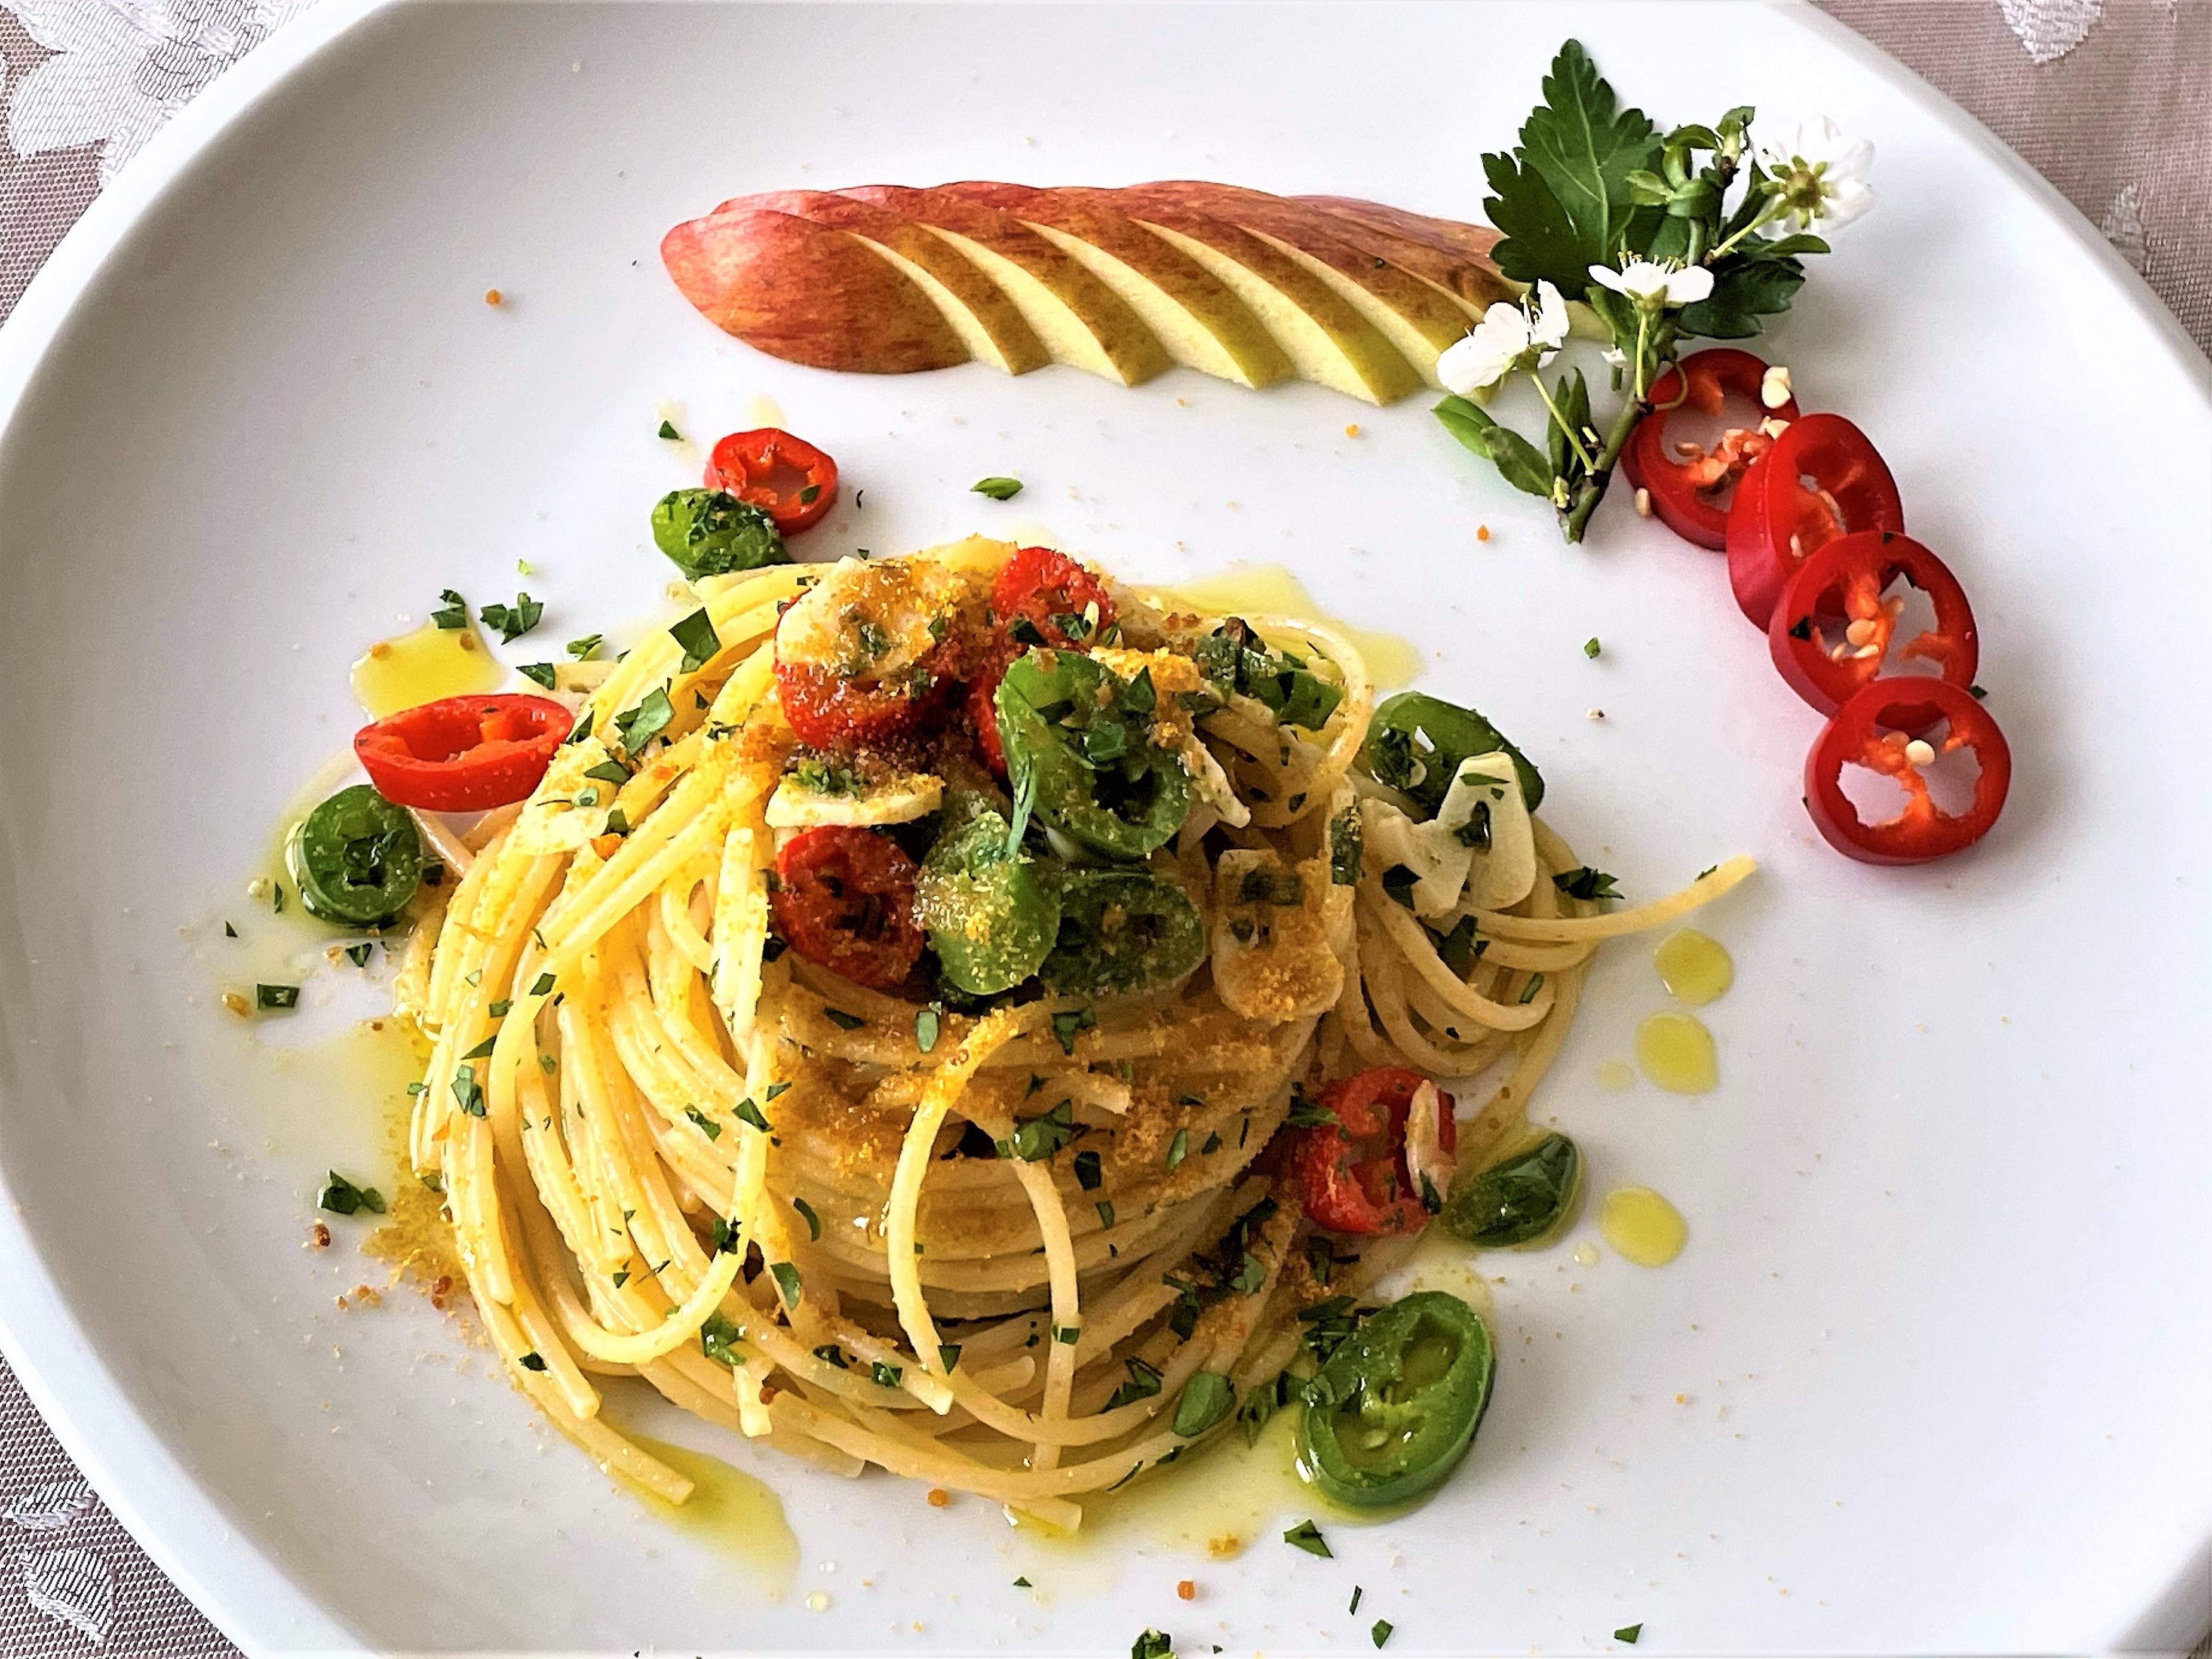 Spaghetti-aglio-olio-peperoncino-e-bottarga